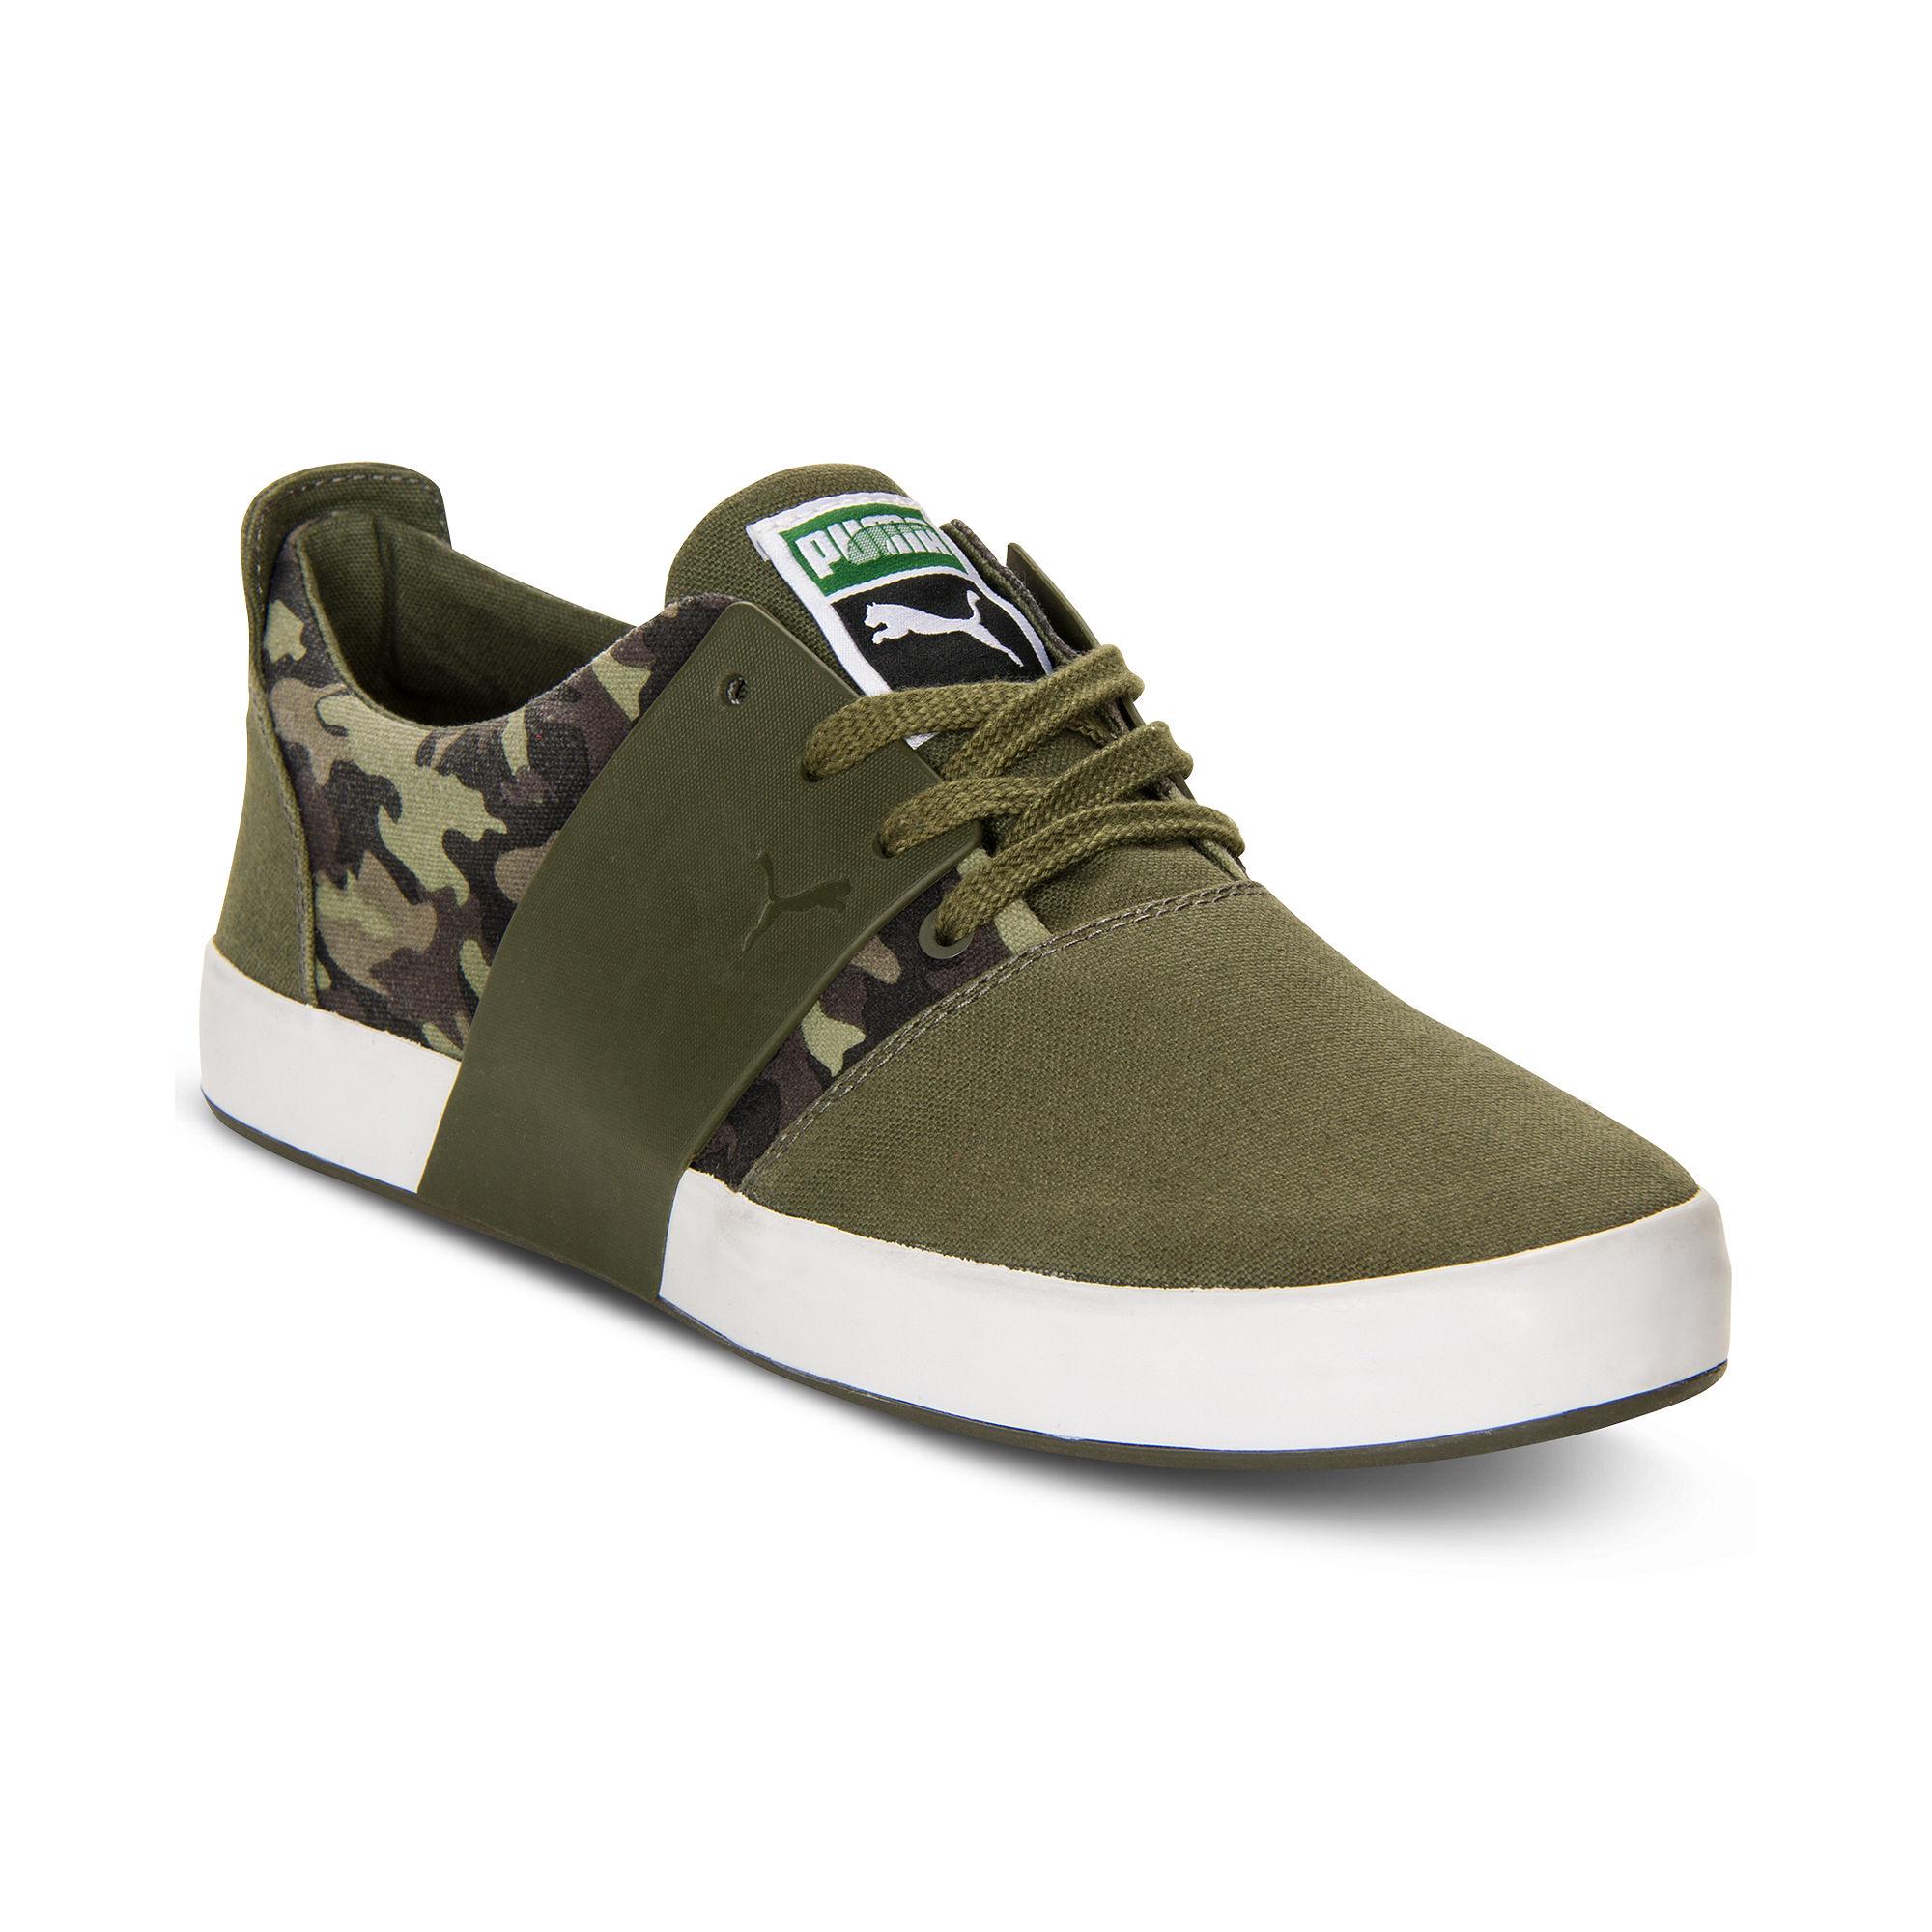 Puma El Ace 3 Camo Sneakers In Green For Men Lyst